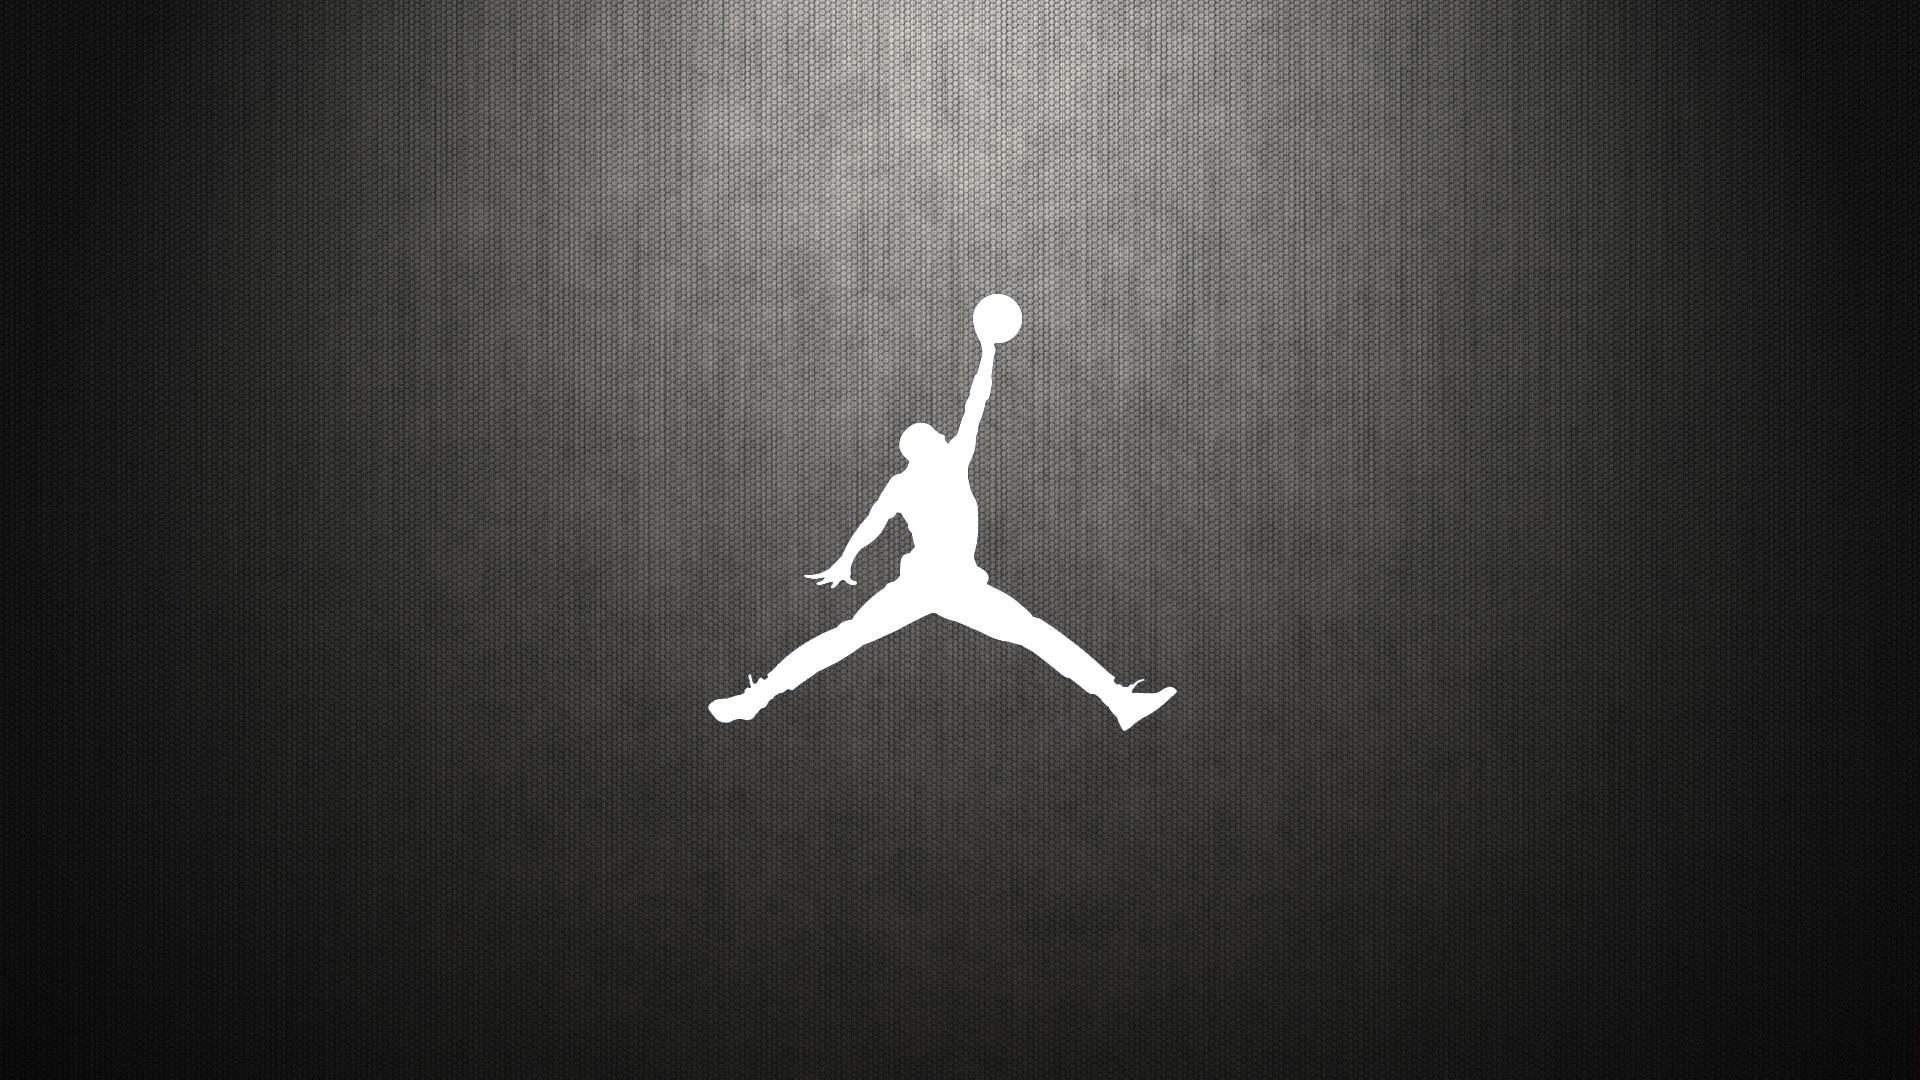 Картинка для заставки спорт